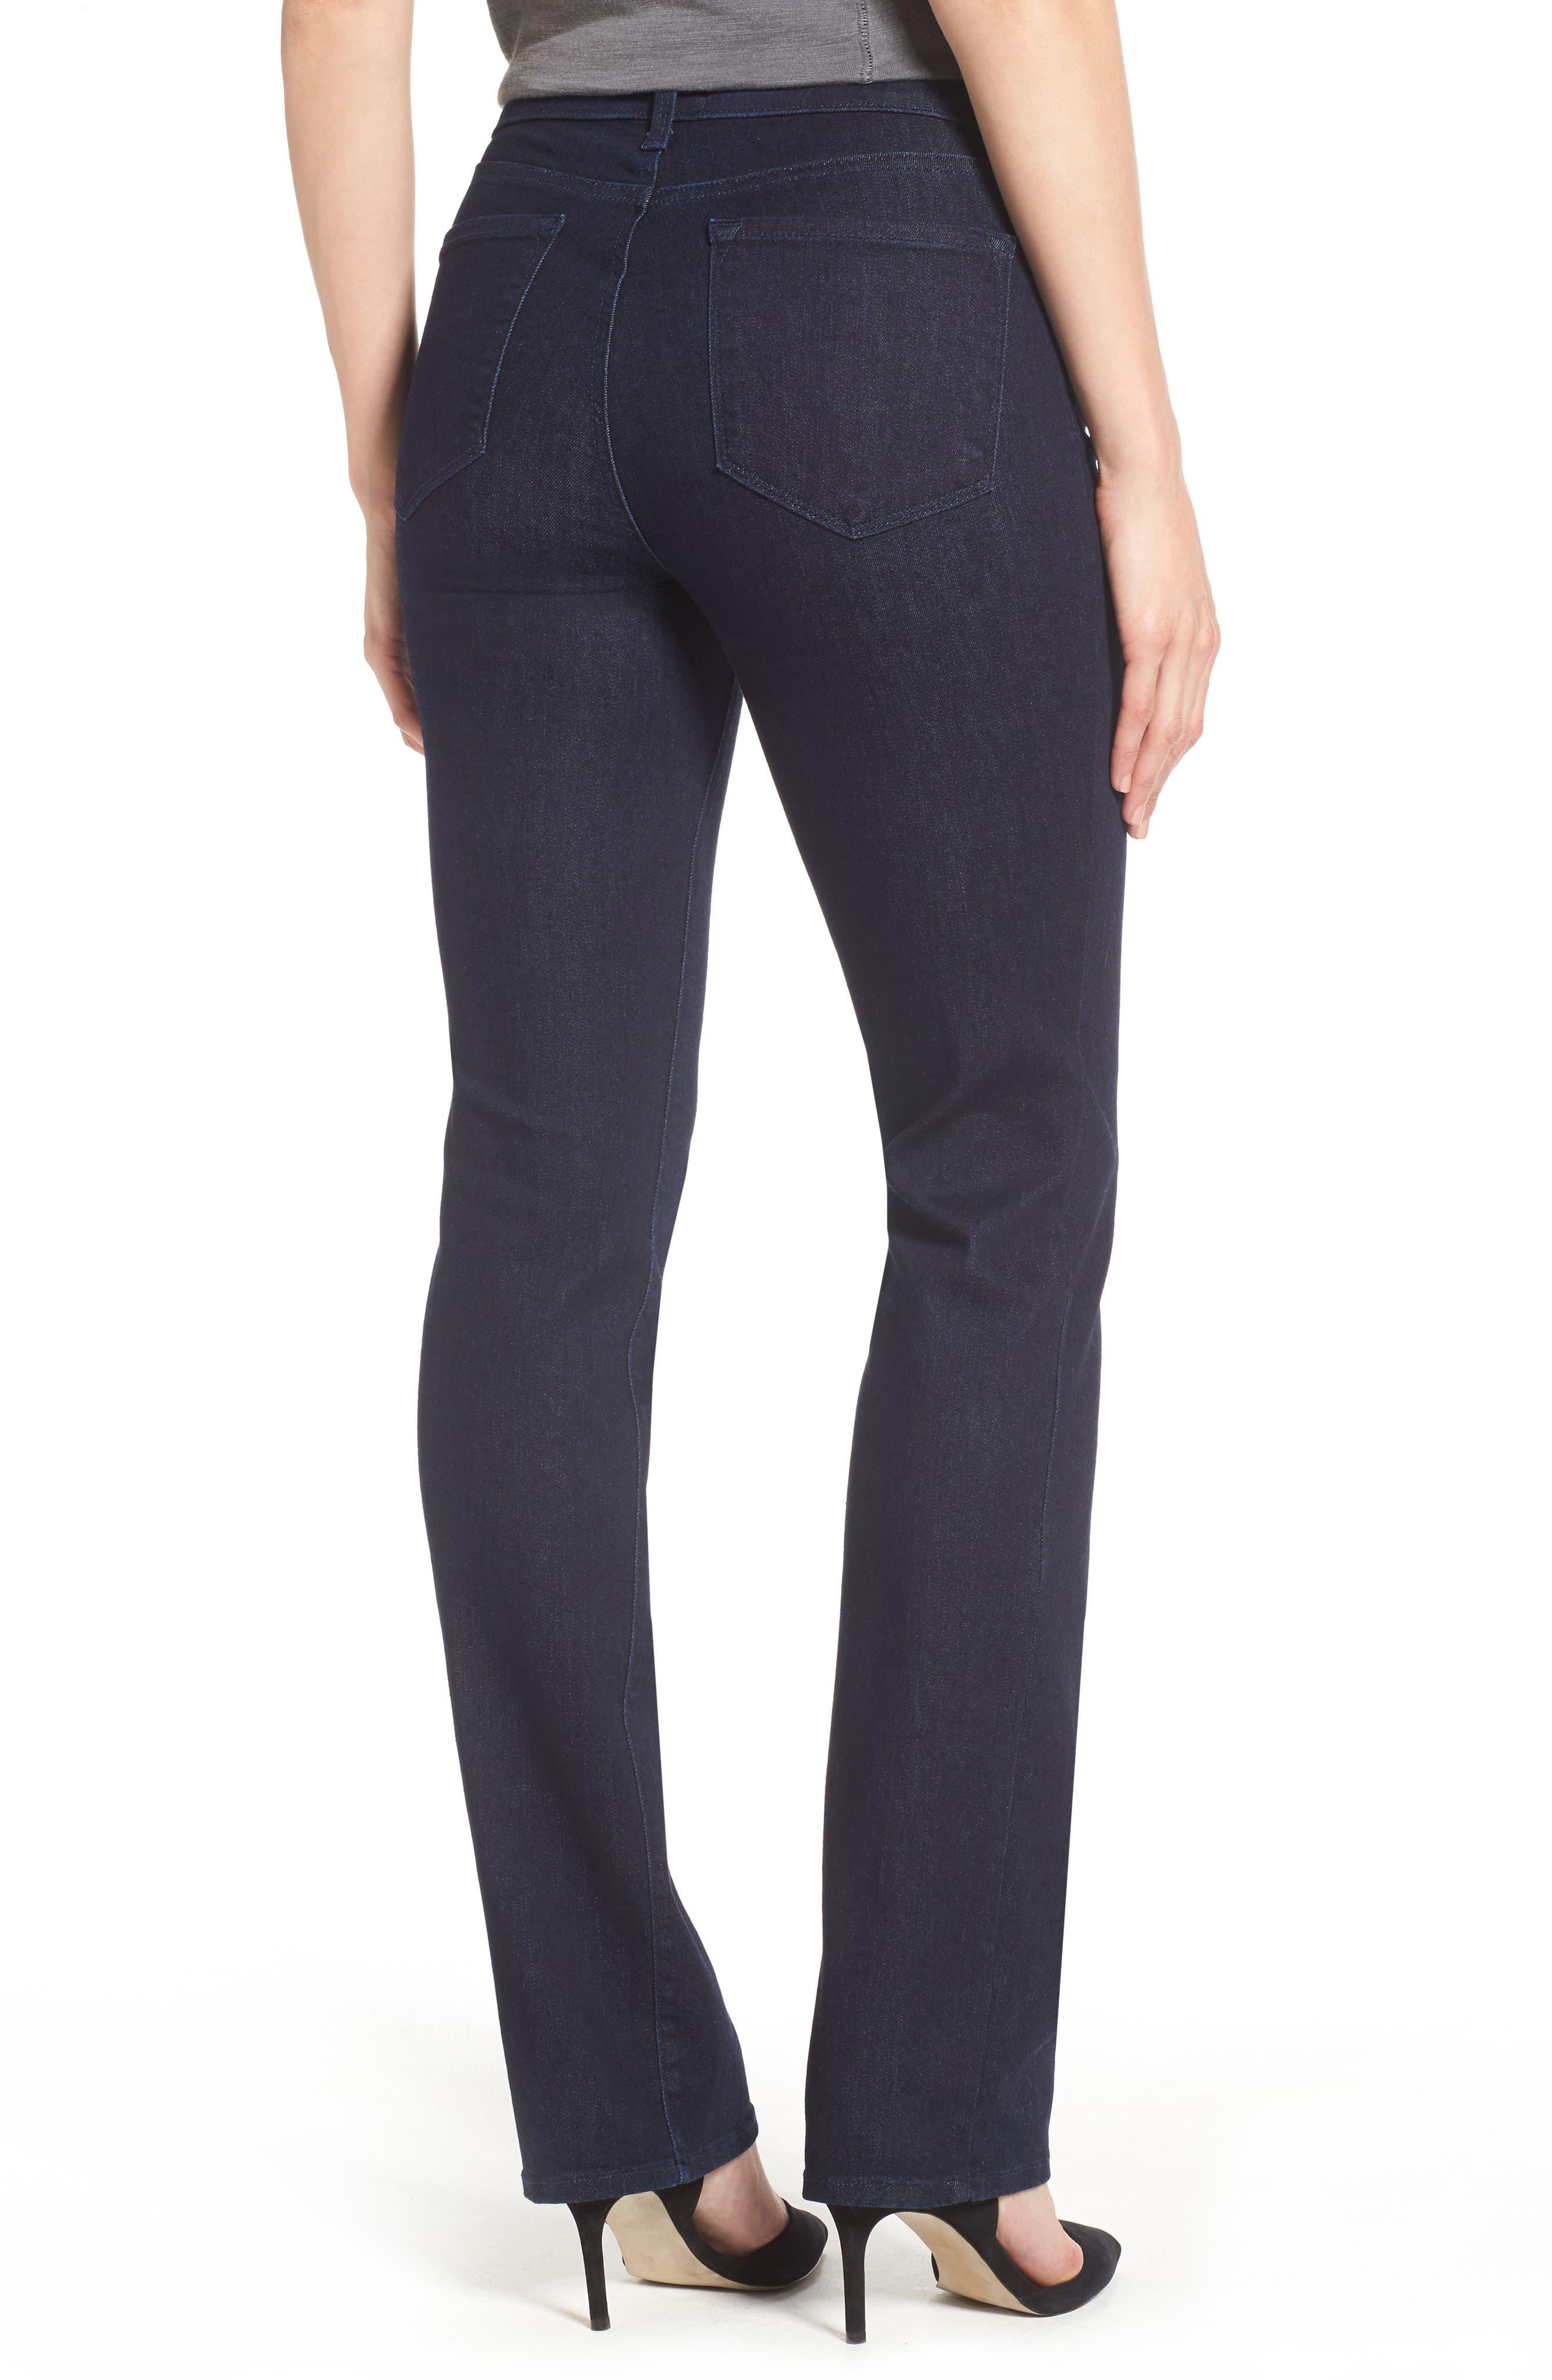 Alternate Image 2  - NYDJ Marilyn Stretch Straight Leg Jeans (Rinse) (Regular & Petite)